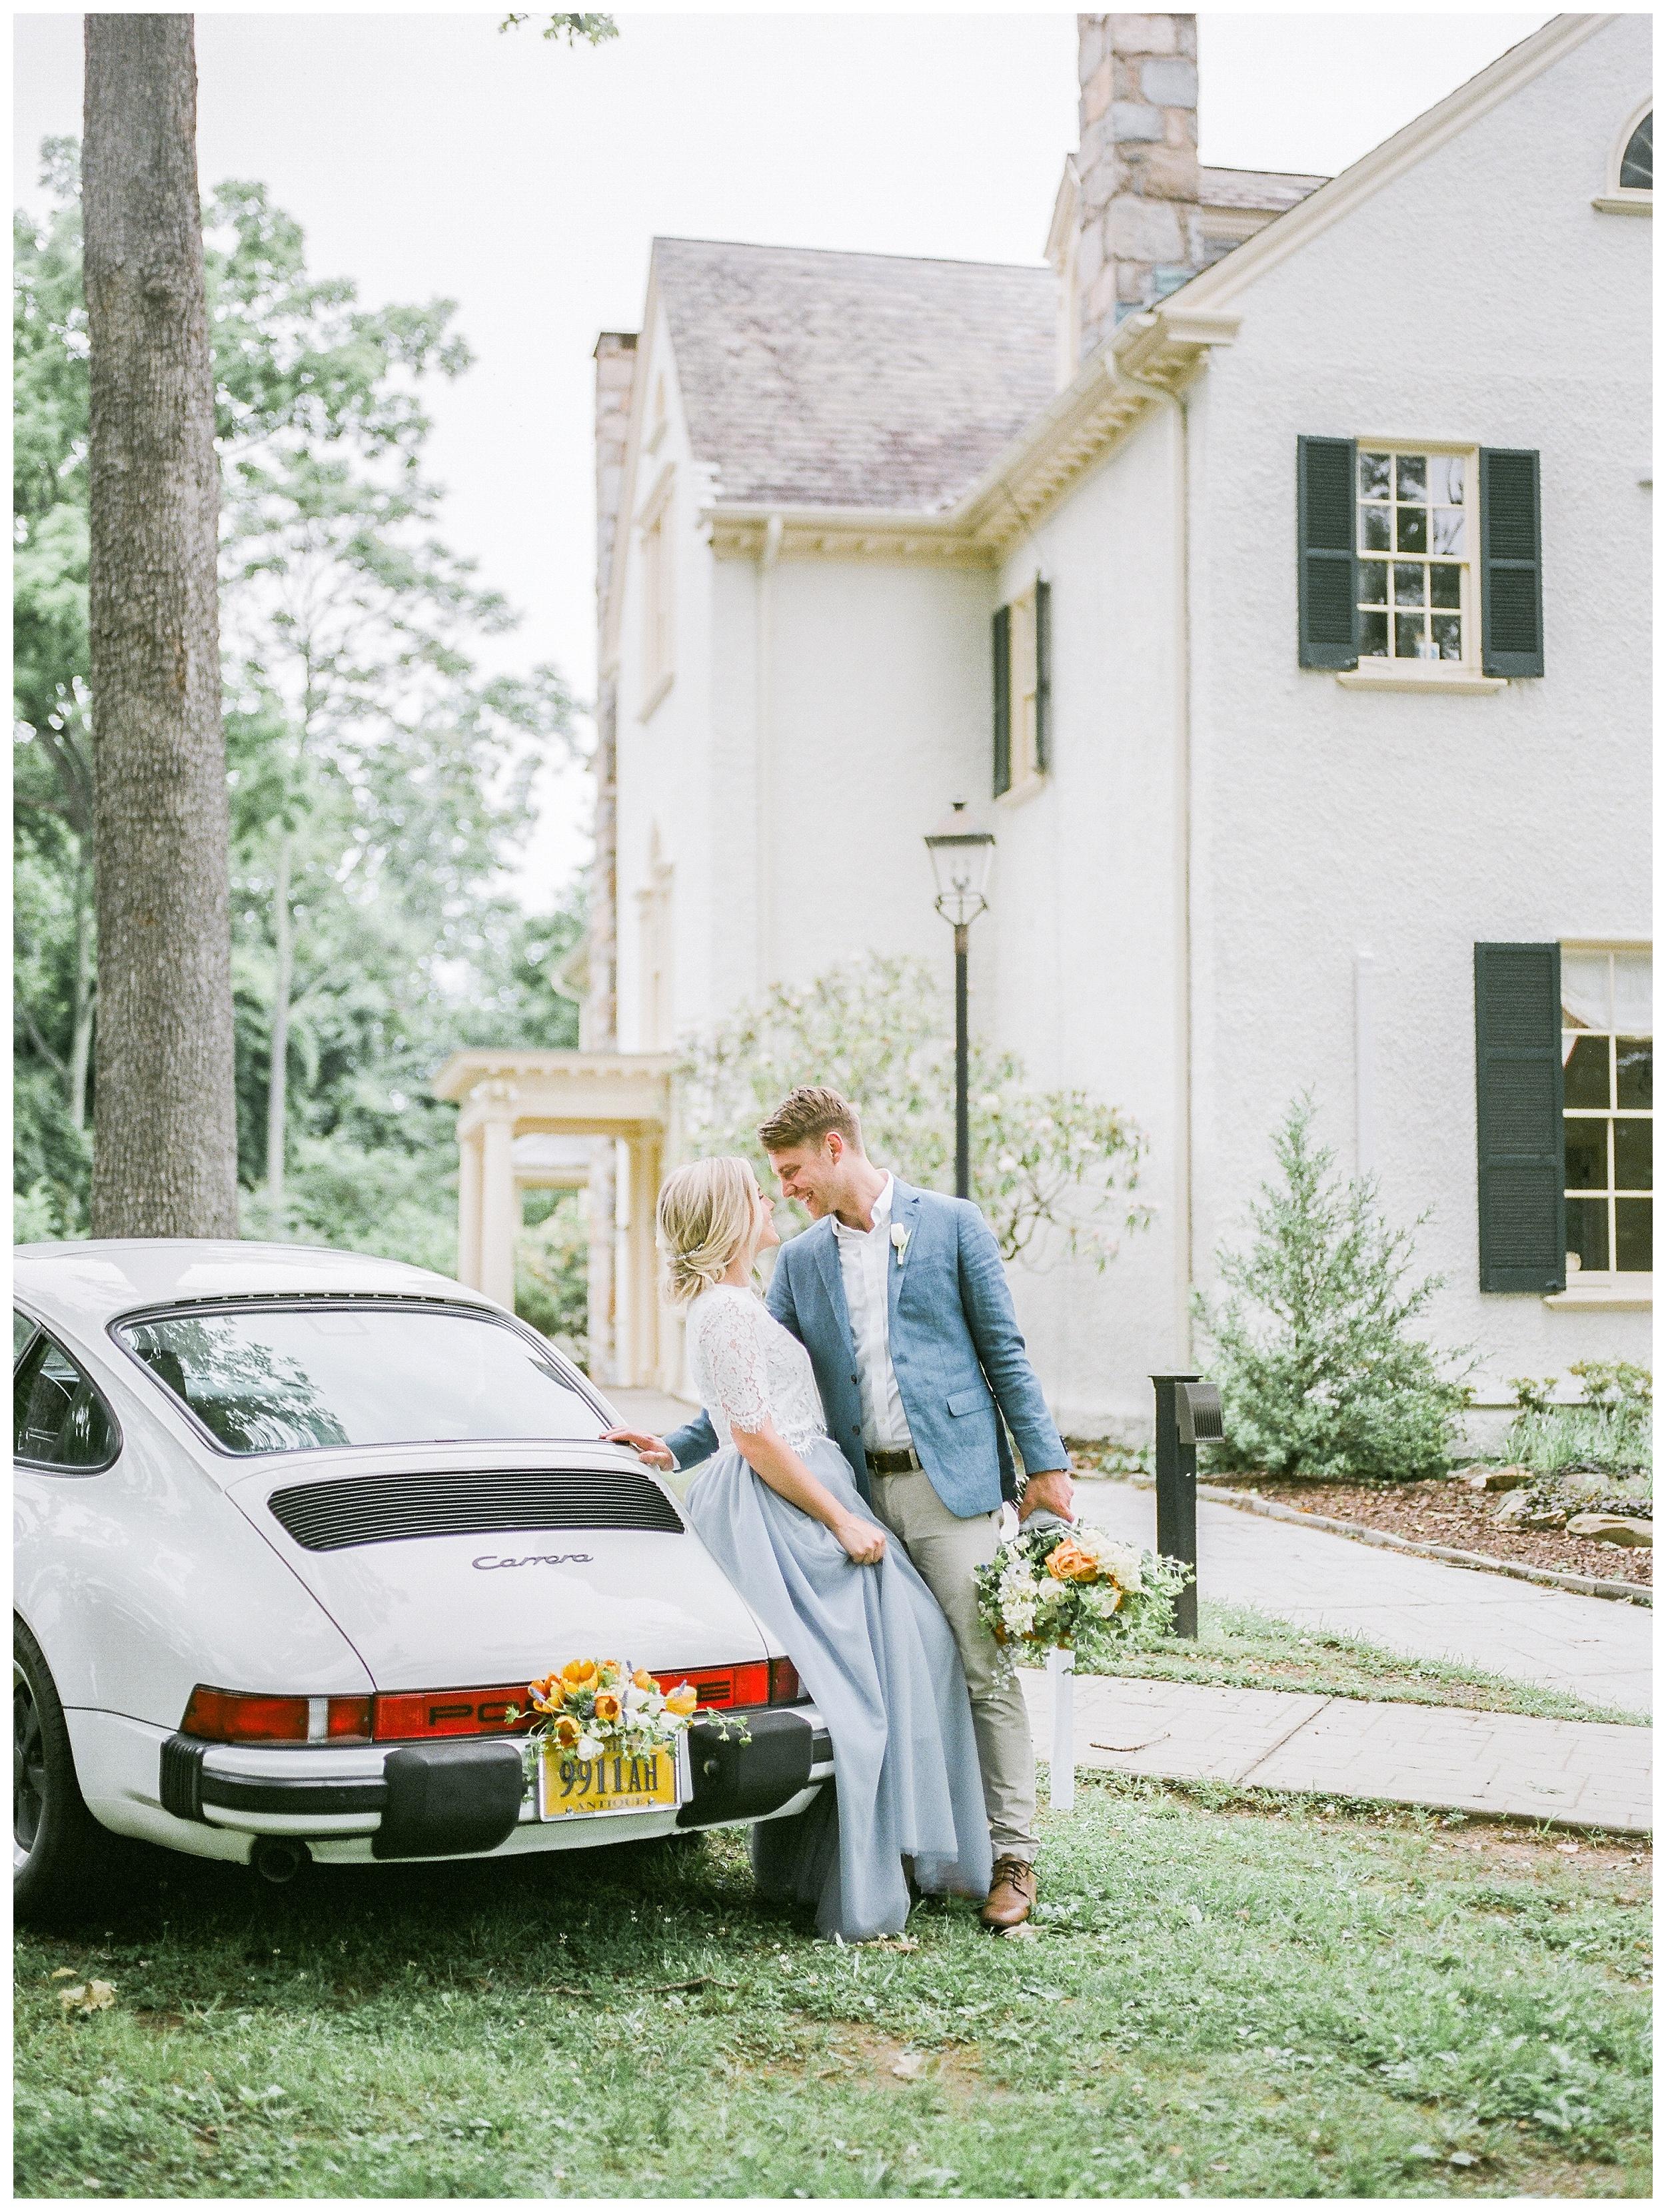 Rust Manor Wedding   Virginia Wedding Photographer Kir Tuben_0001.jpg